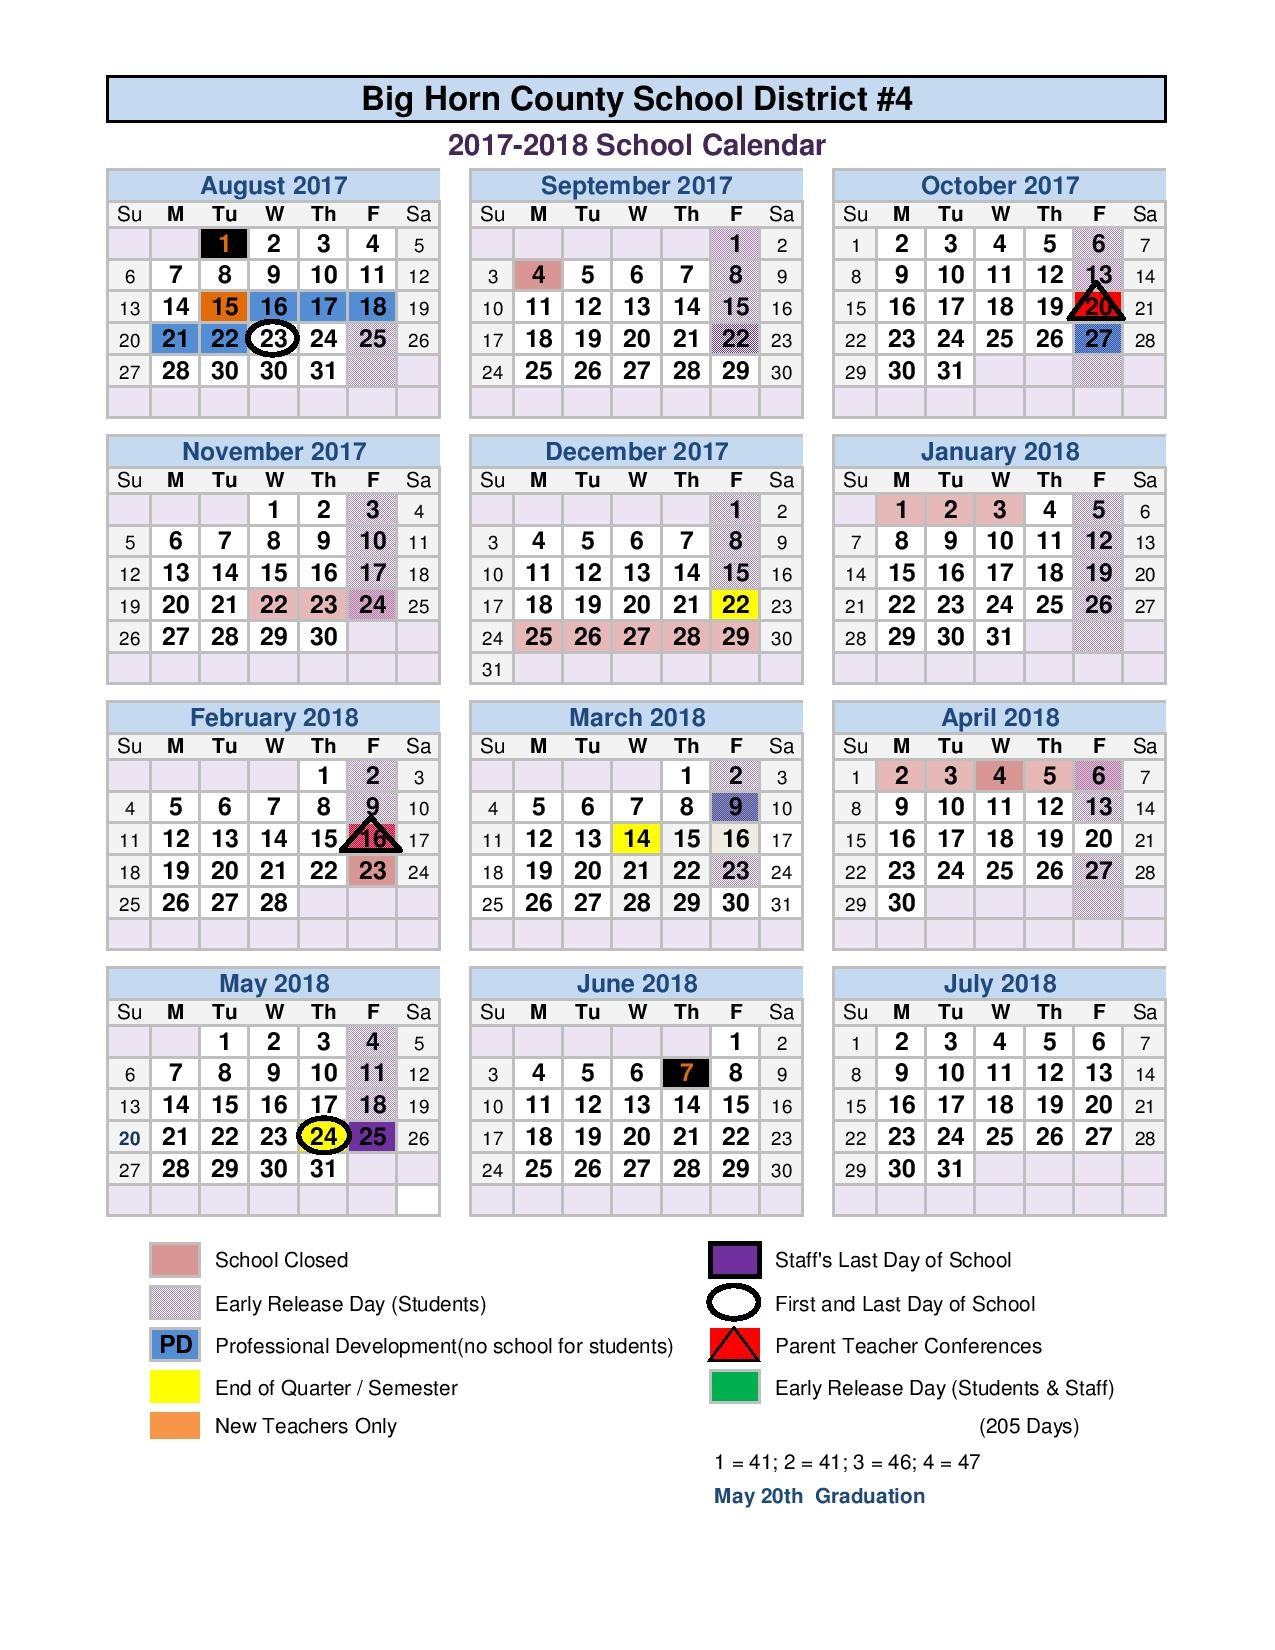 School Calendar for 2017-2018